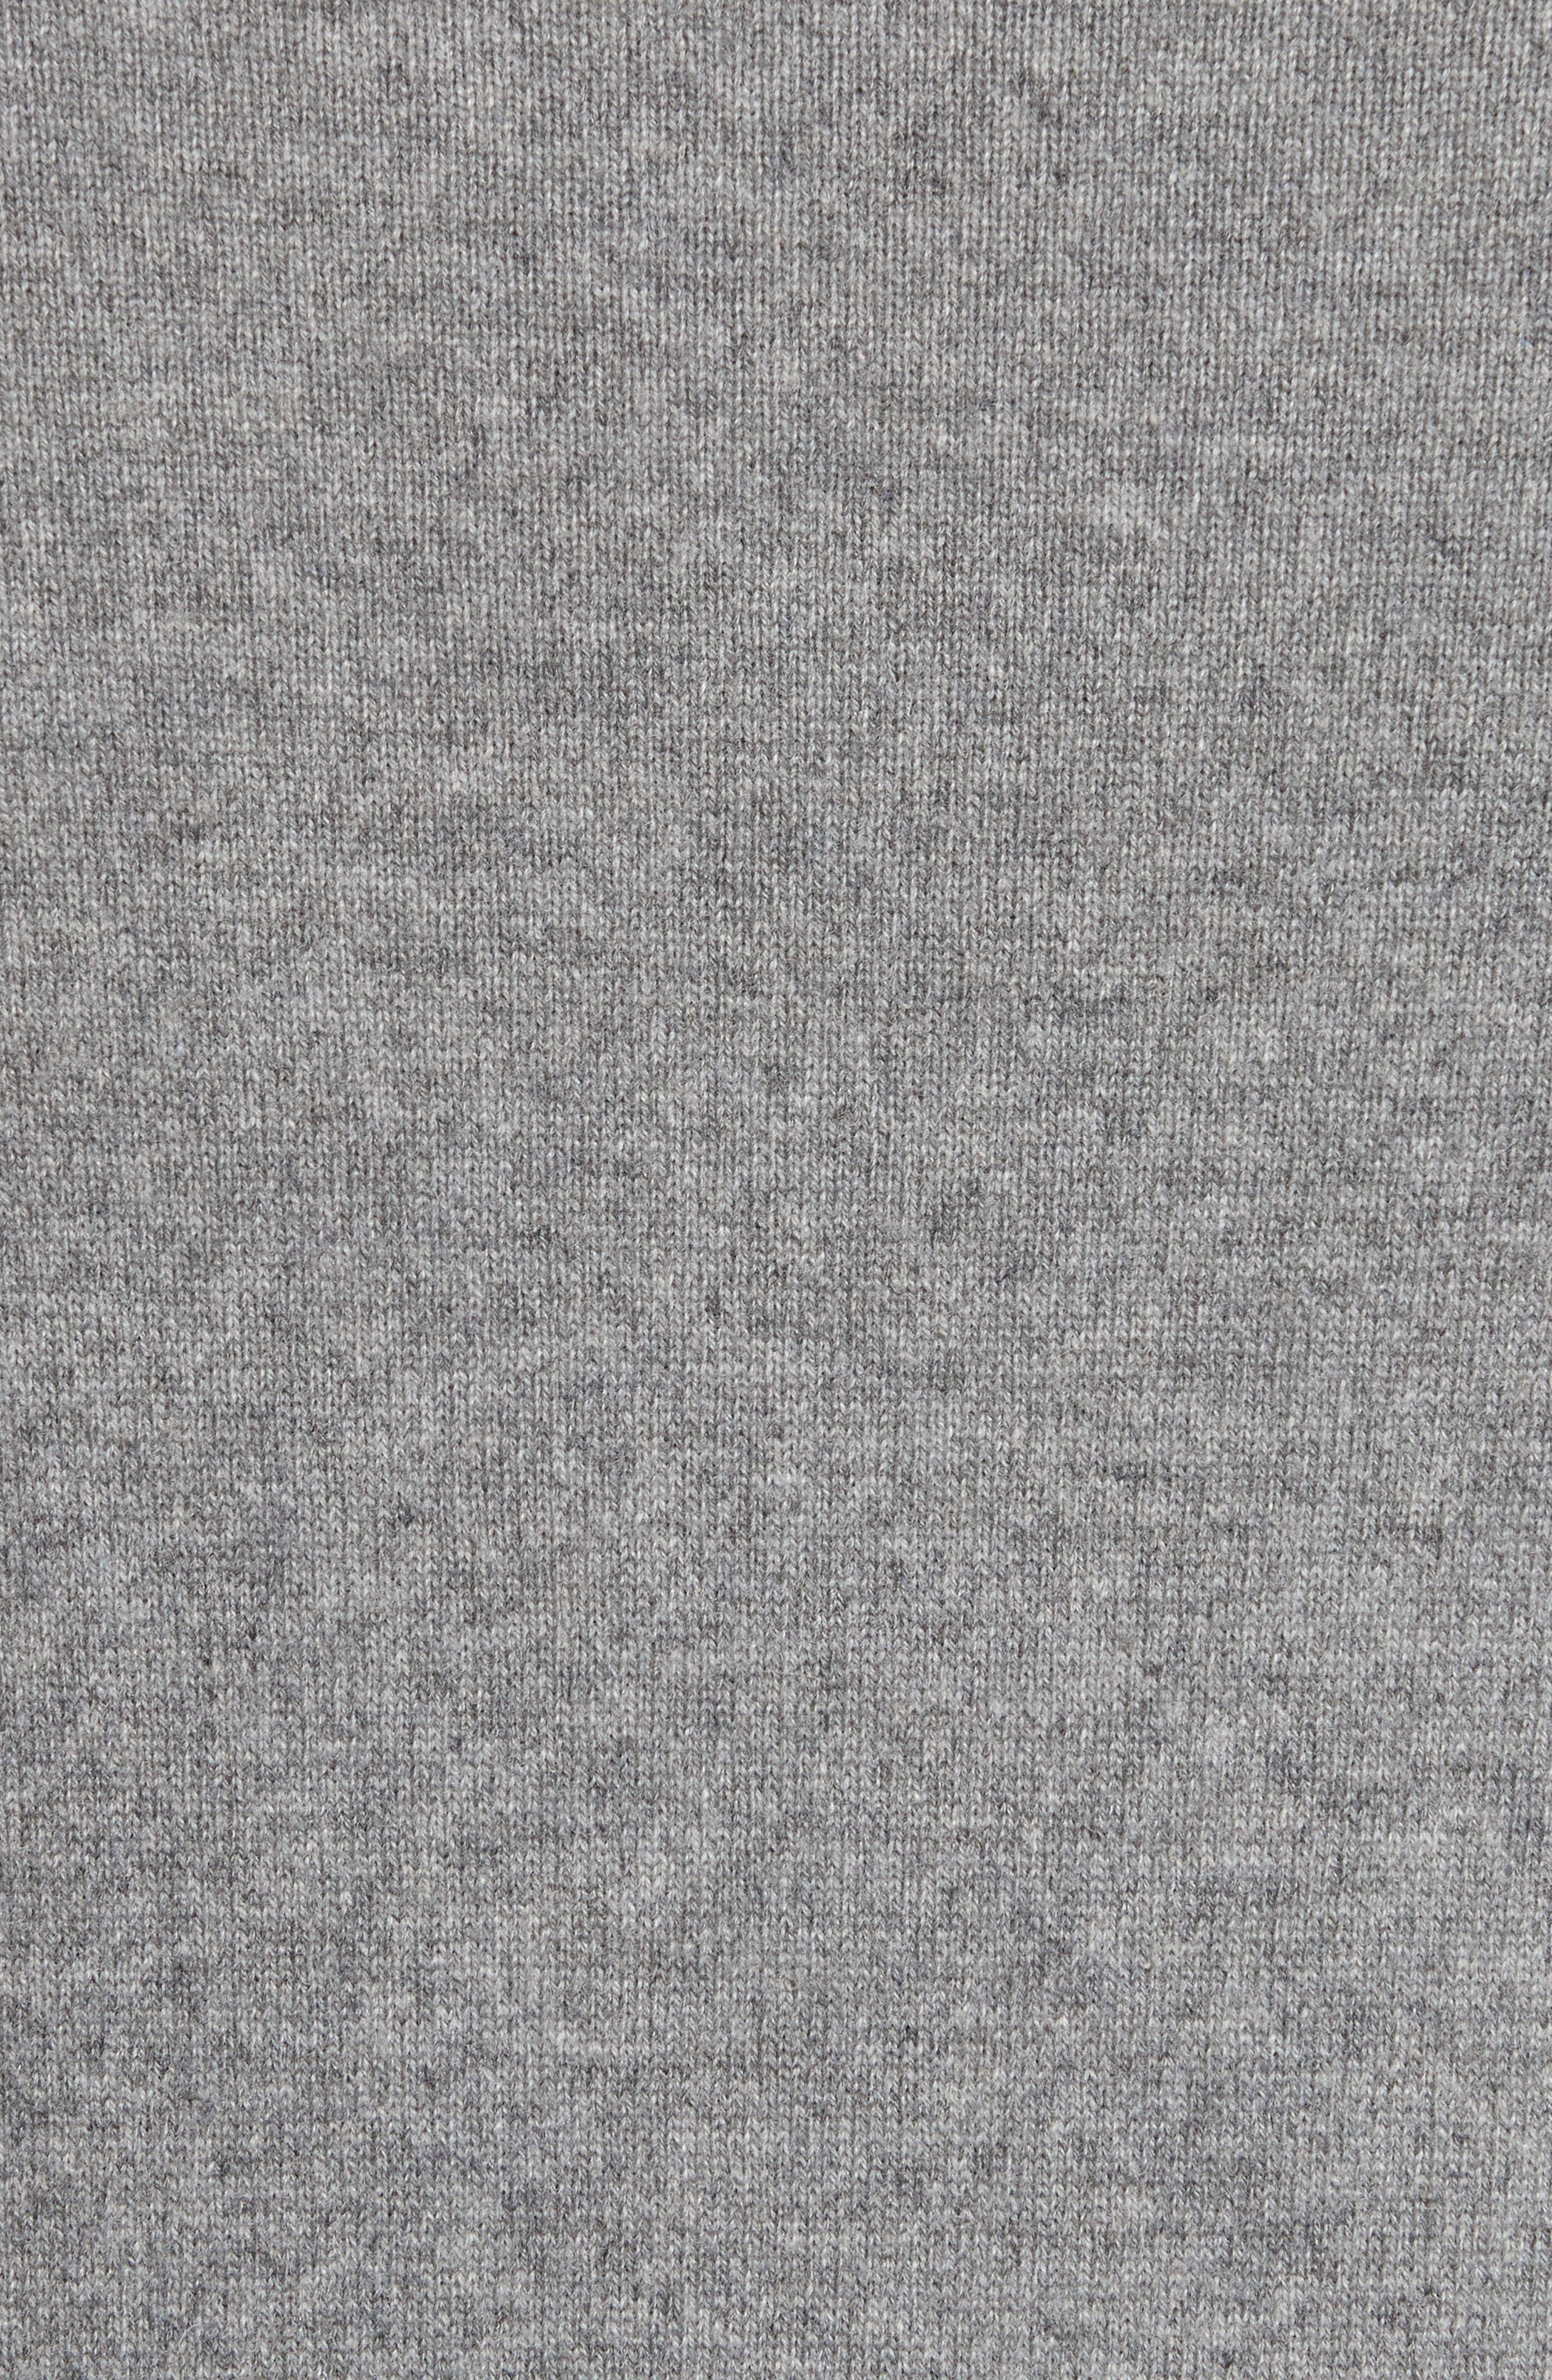 Turtleneck Sweater,                             Alternate thumbnail 5, color,                             Grey